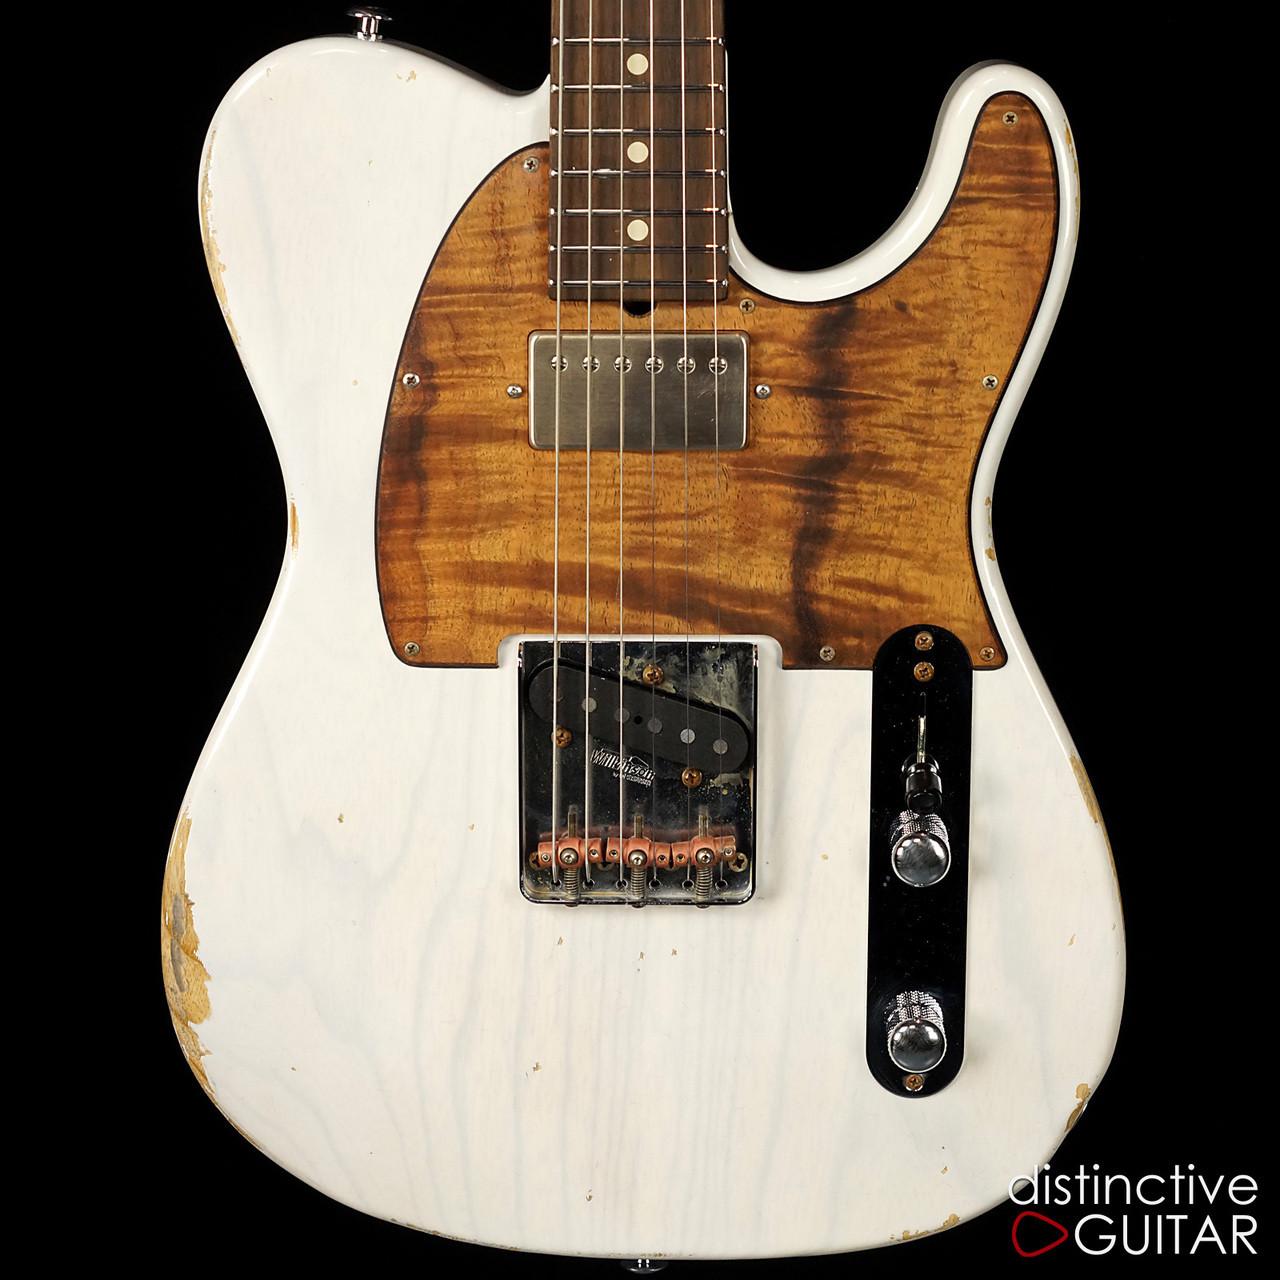 Suhr Classic T Wiring Diagram Guitar Antique Custom Trans White Js8d8y Rh Distinctiveguitar Com S The